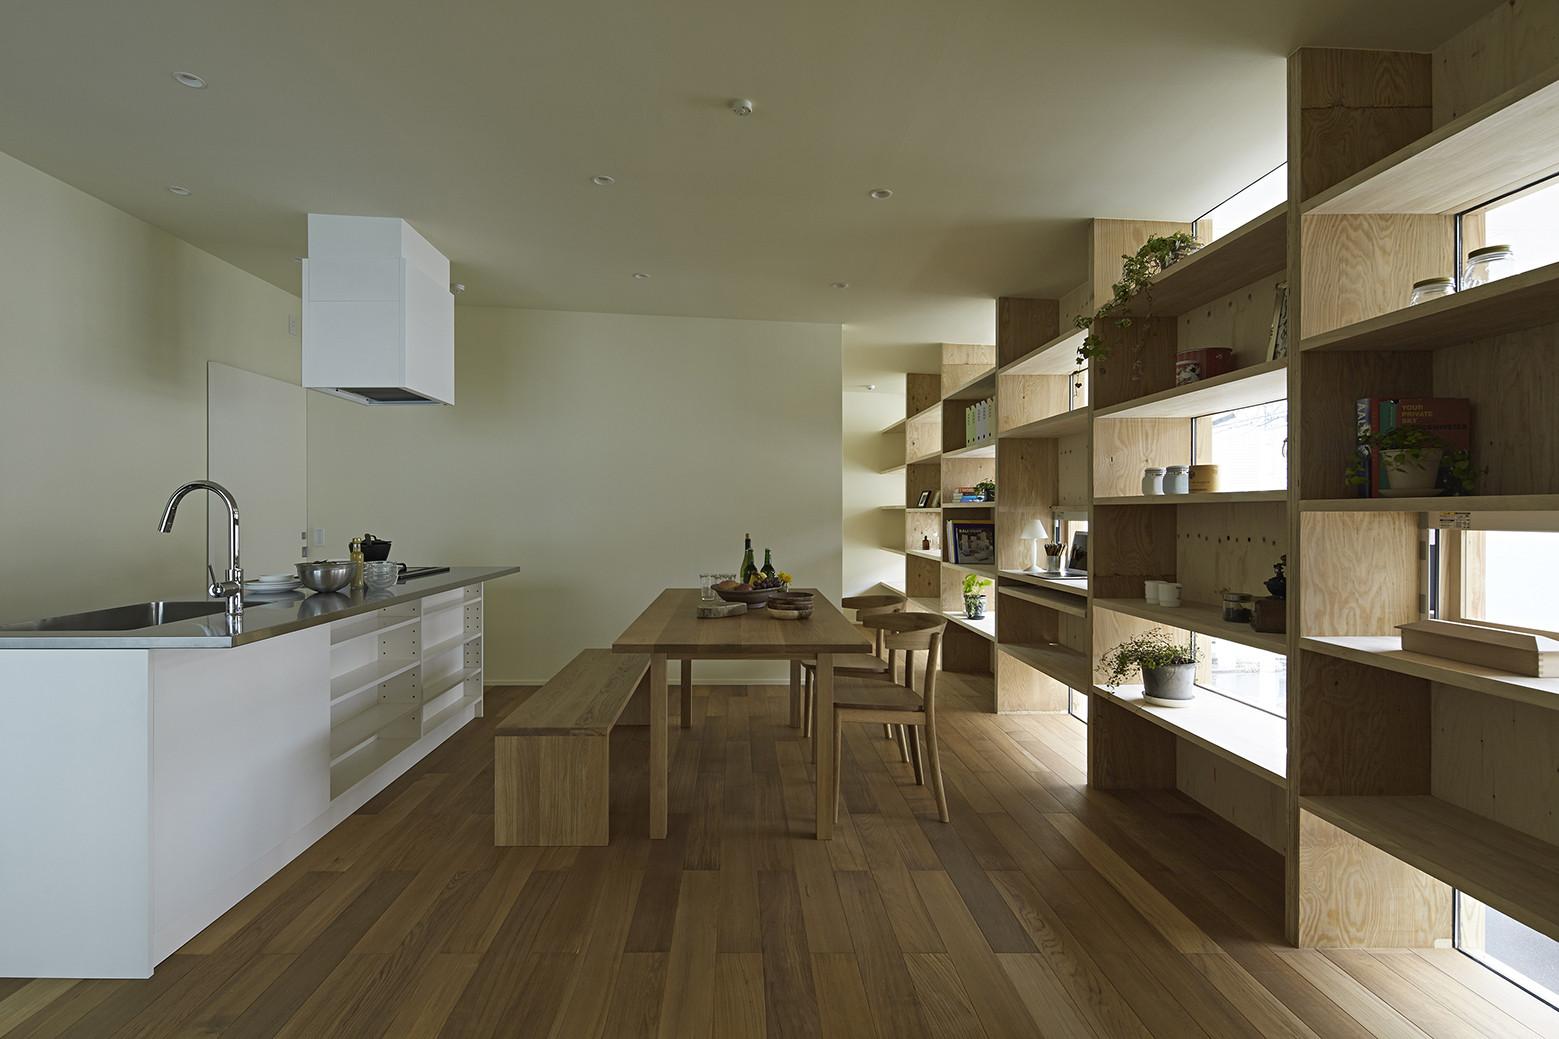 Casa a Cuadros / Takeshi Shikauchi Architect Office, © Koichi Torimura